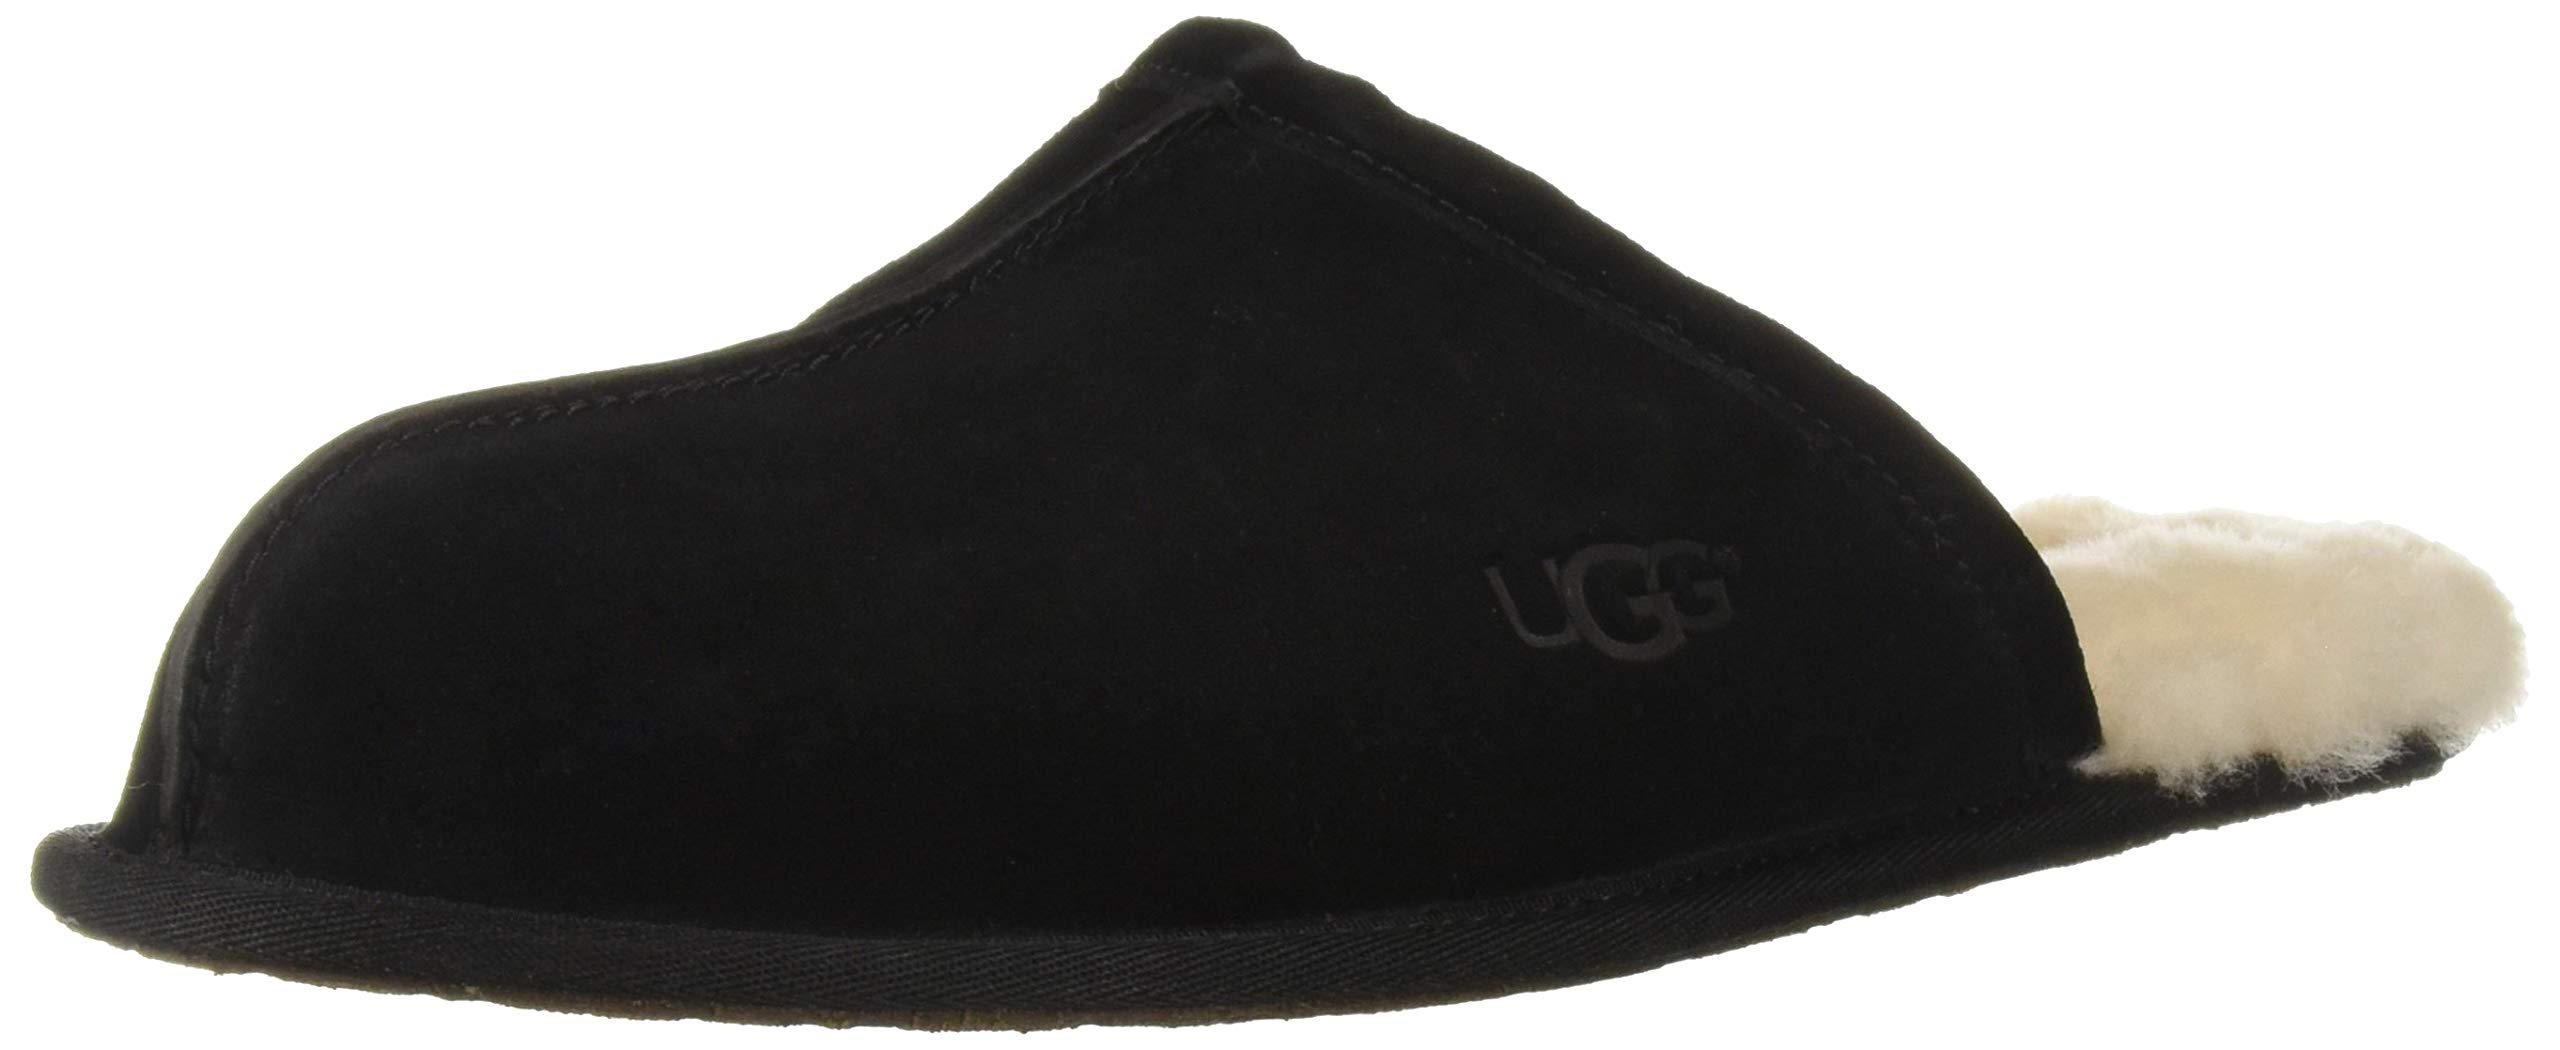 UGG Men's Scuff Slipper Black 13 M US